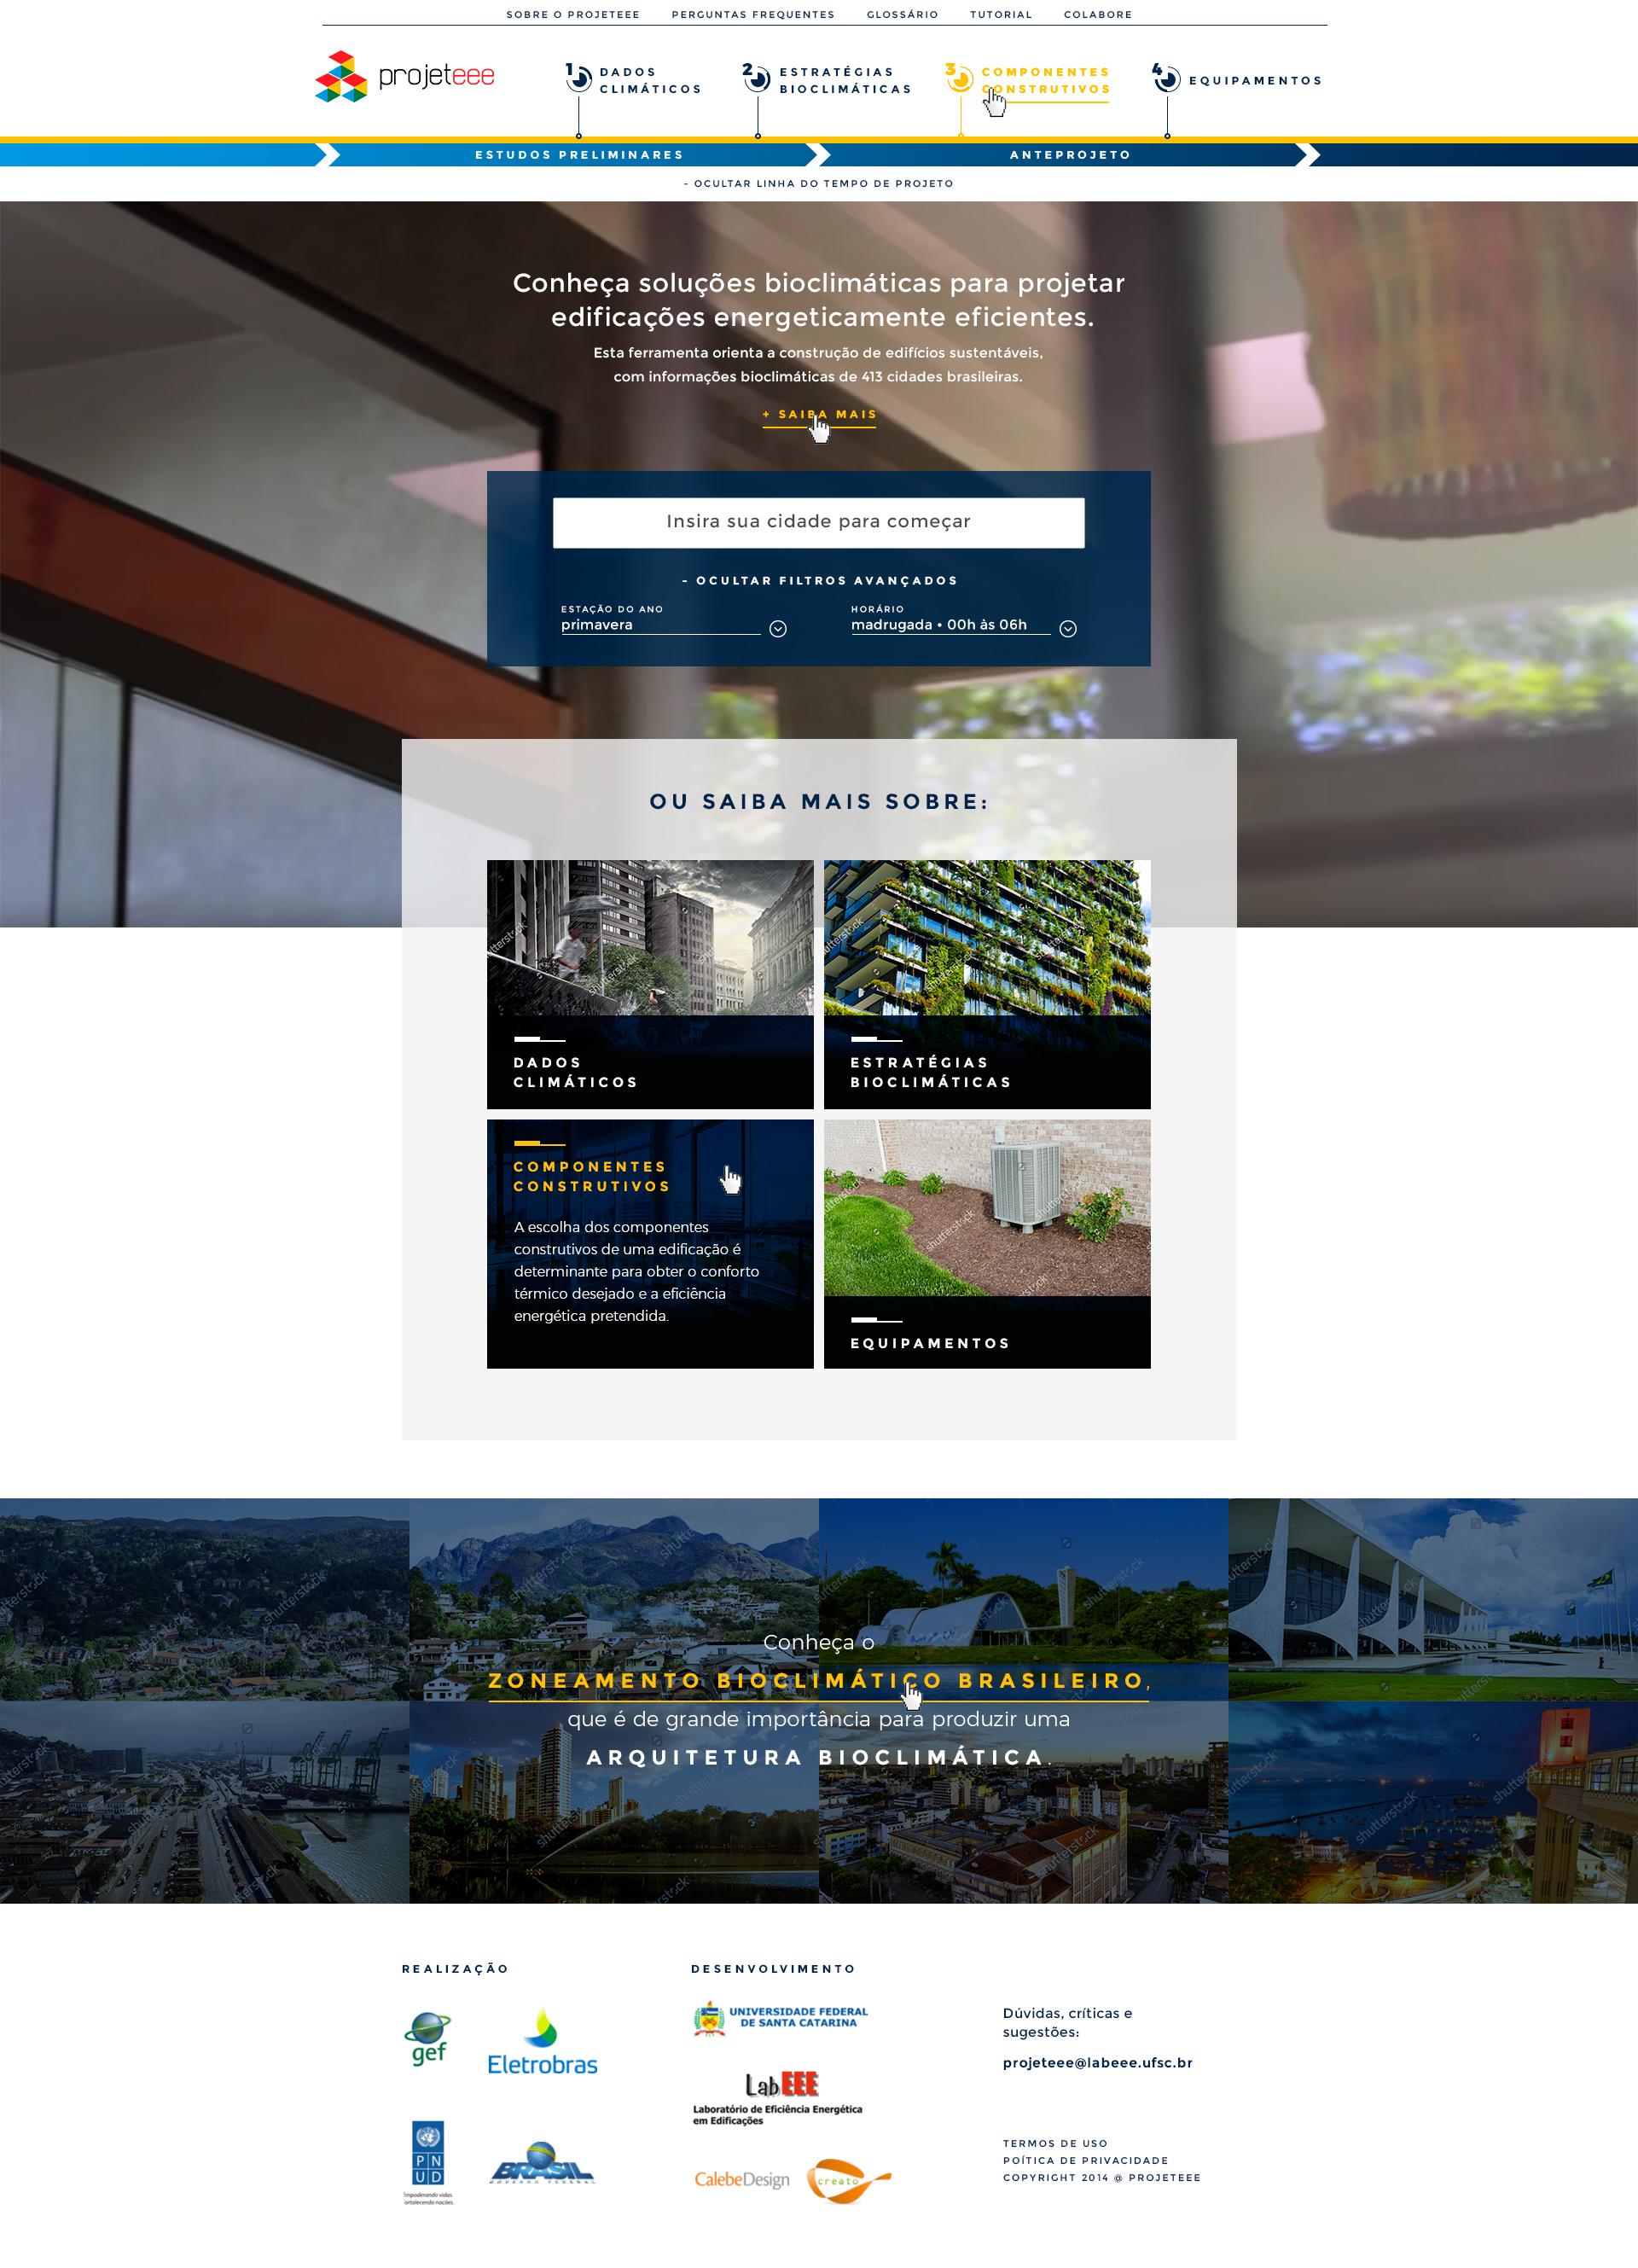 Plataforma Projeteee - http://projeteee.mma.gov.br/  Cliente: MMA (Ministério do Meio Ambiente) e PNUD